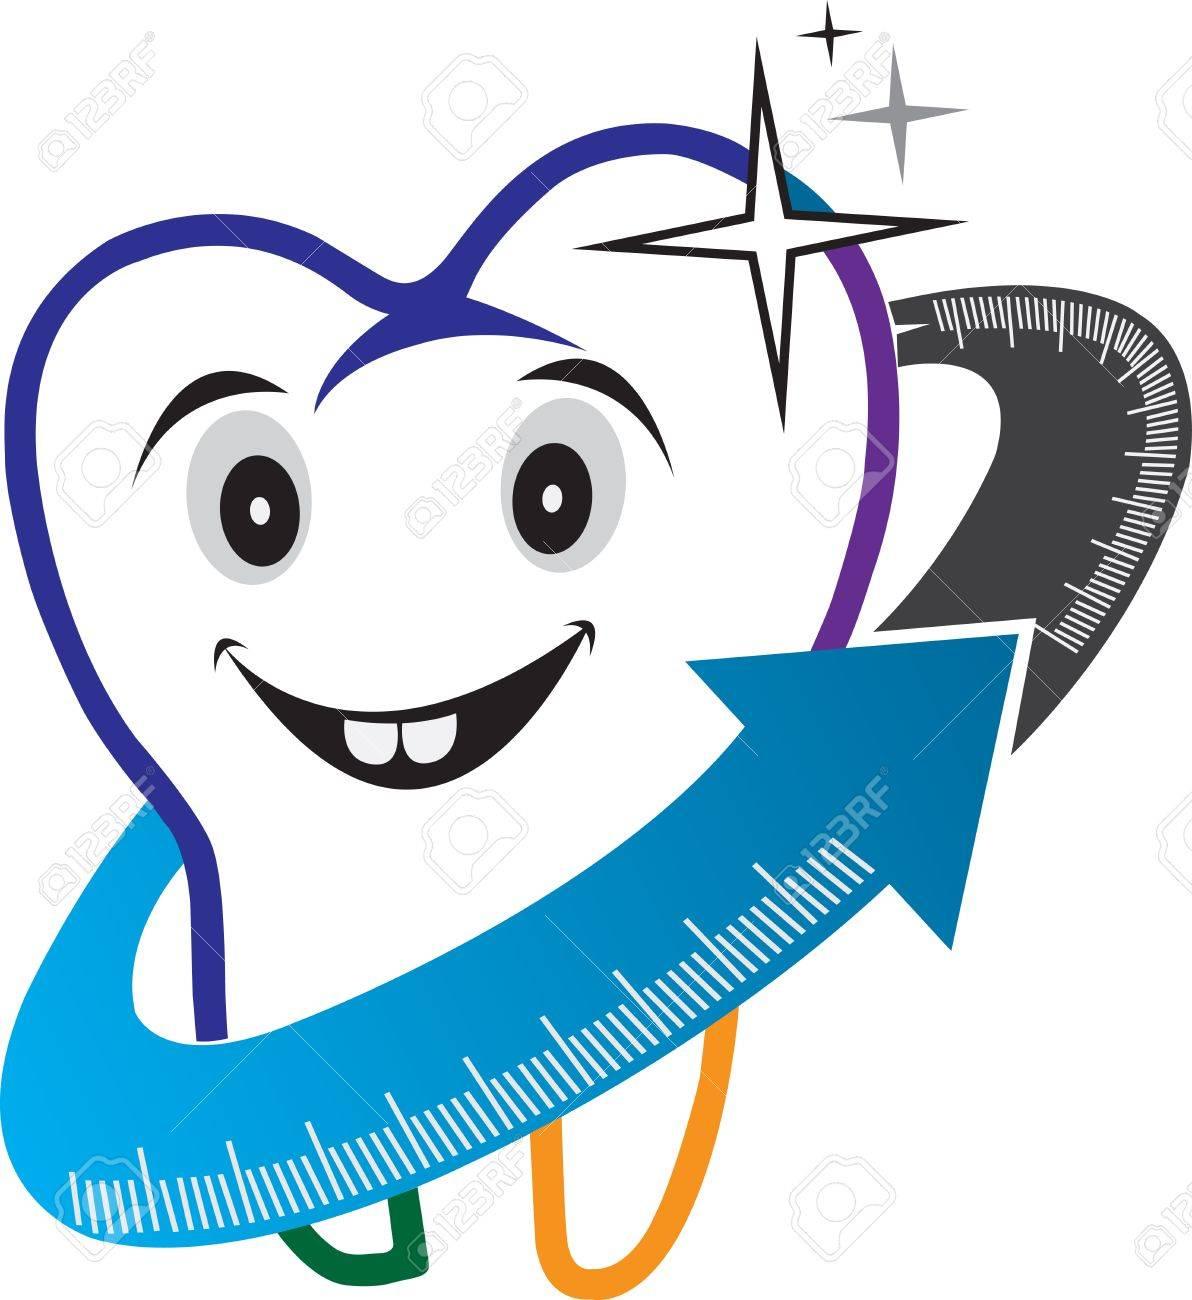 2,842 Dental Logo Stock Vector Illustration And Royalty Free ...